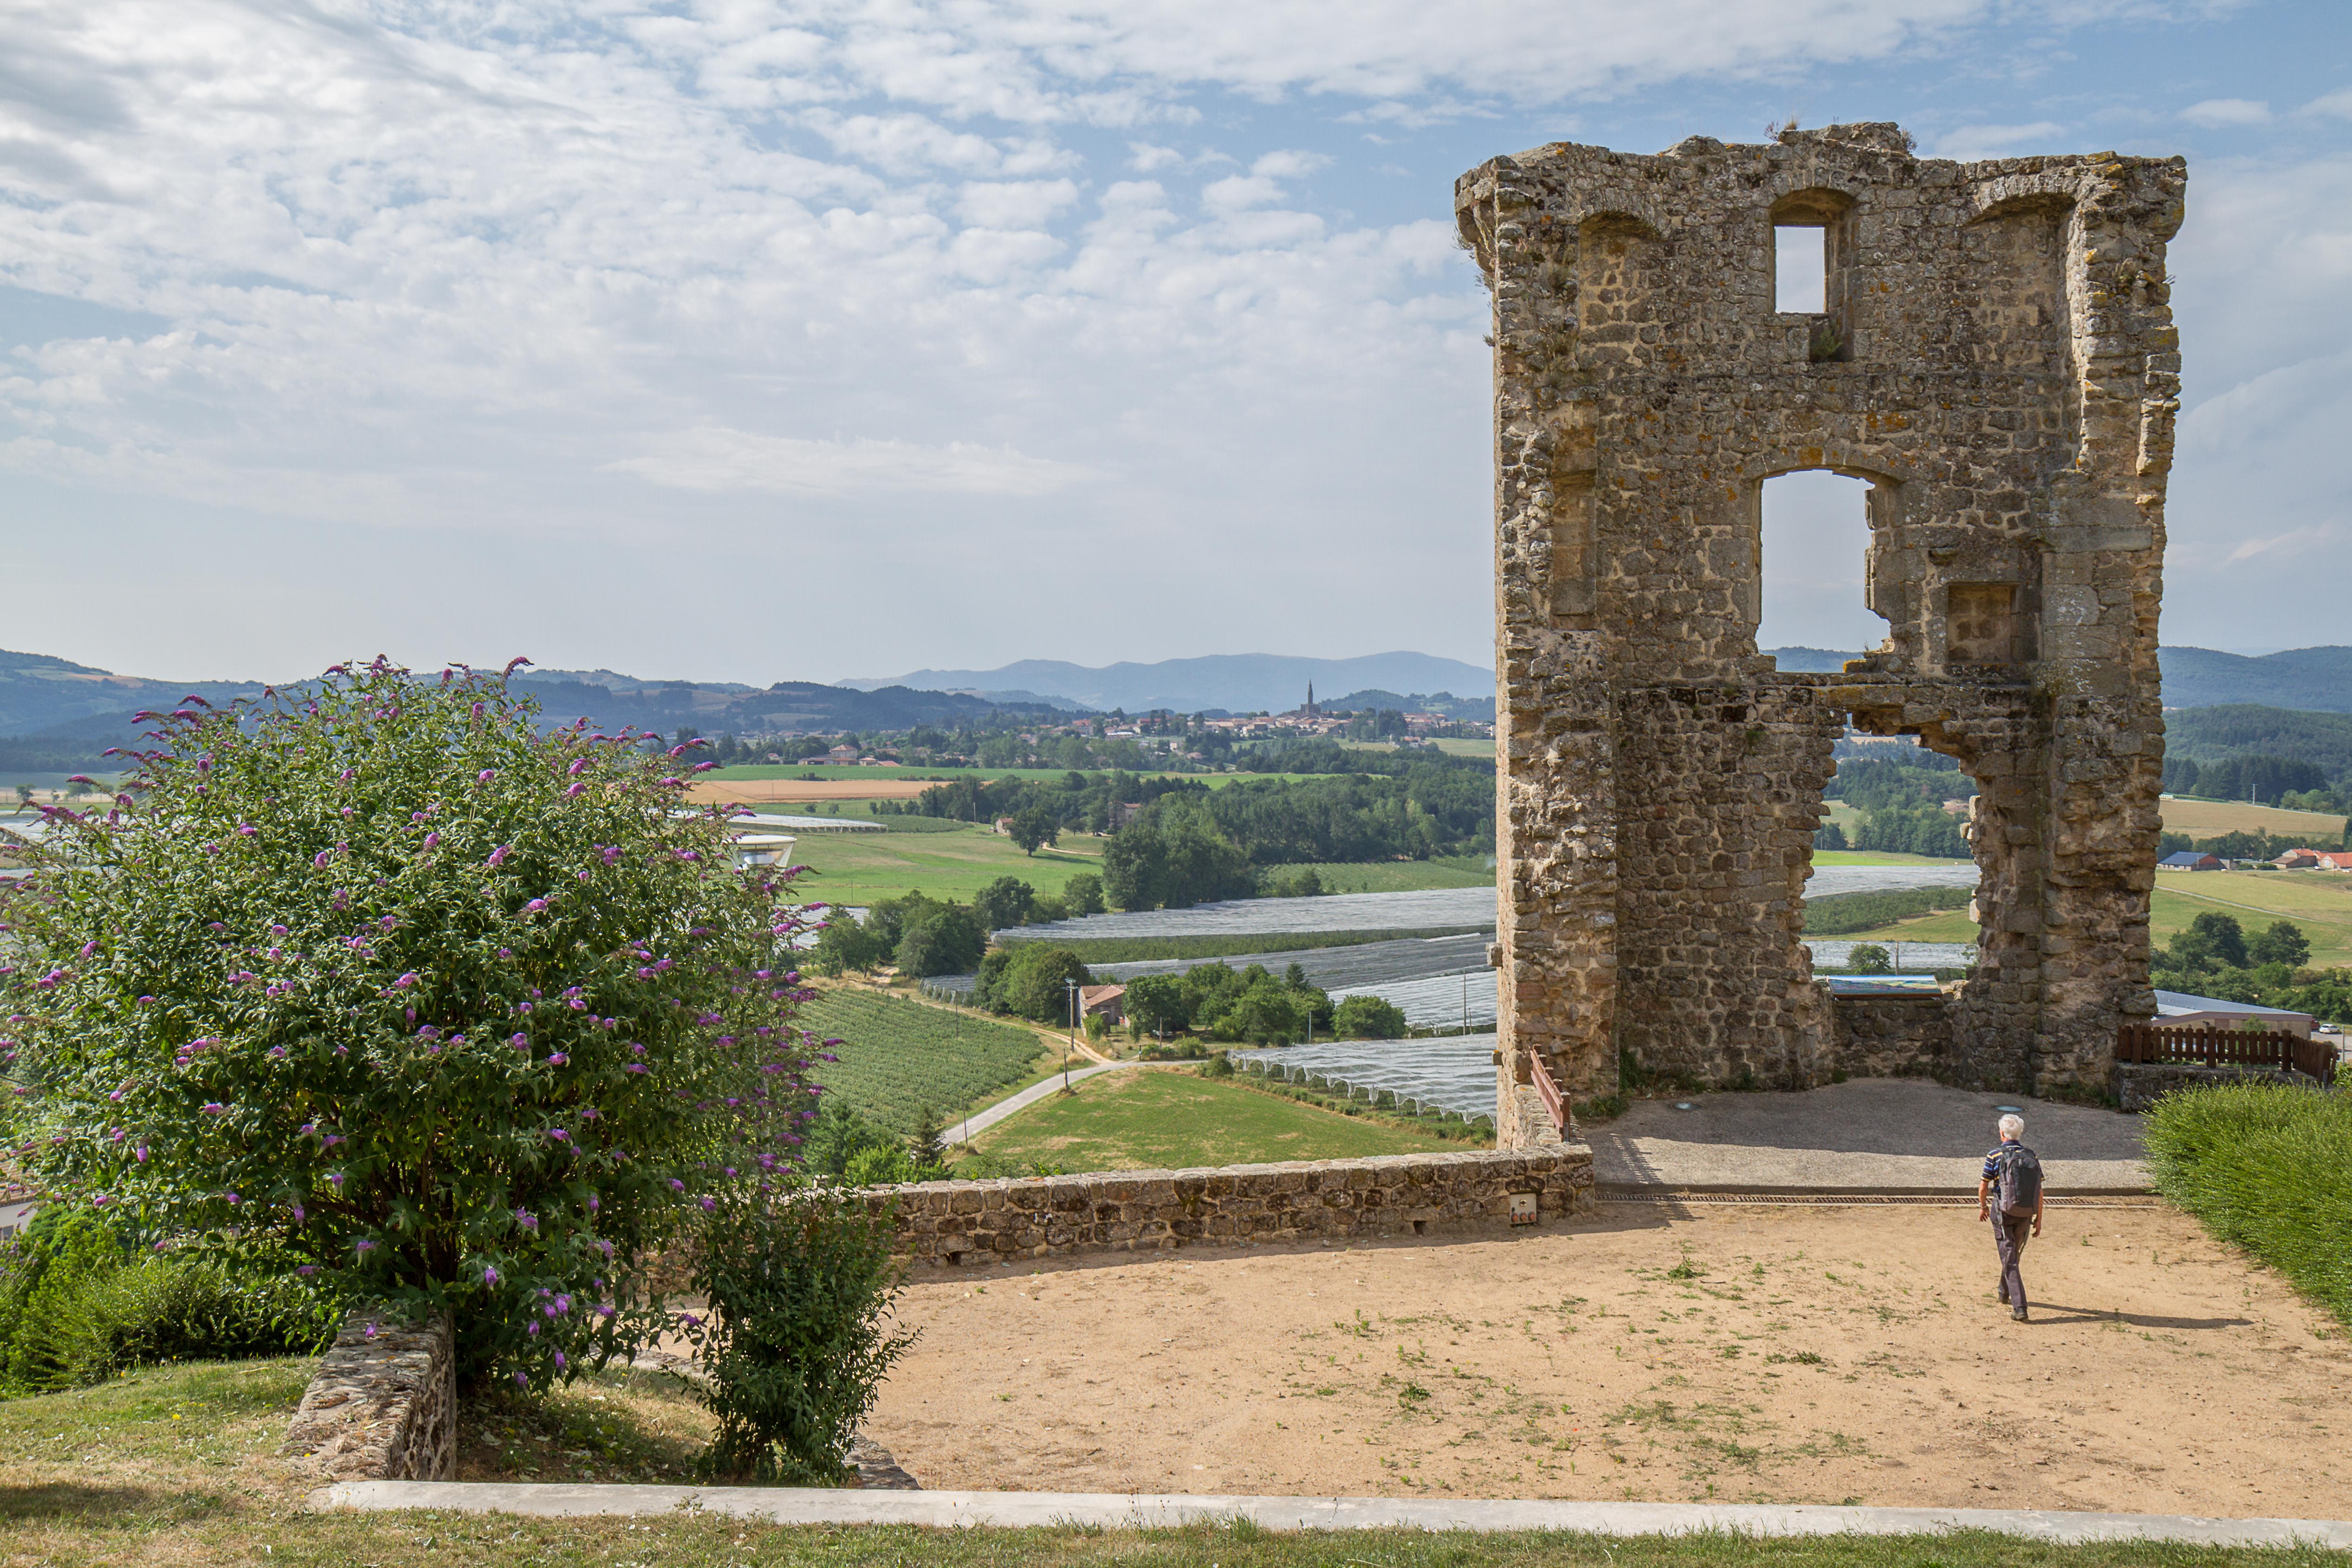 Ga op speurtocht : Tour de Châteauneuf-de-Vernoux (vestiges)